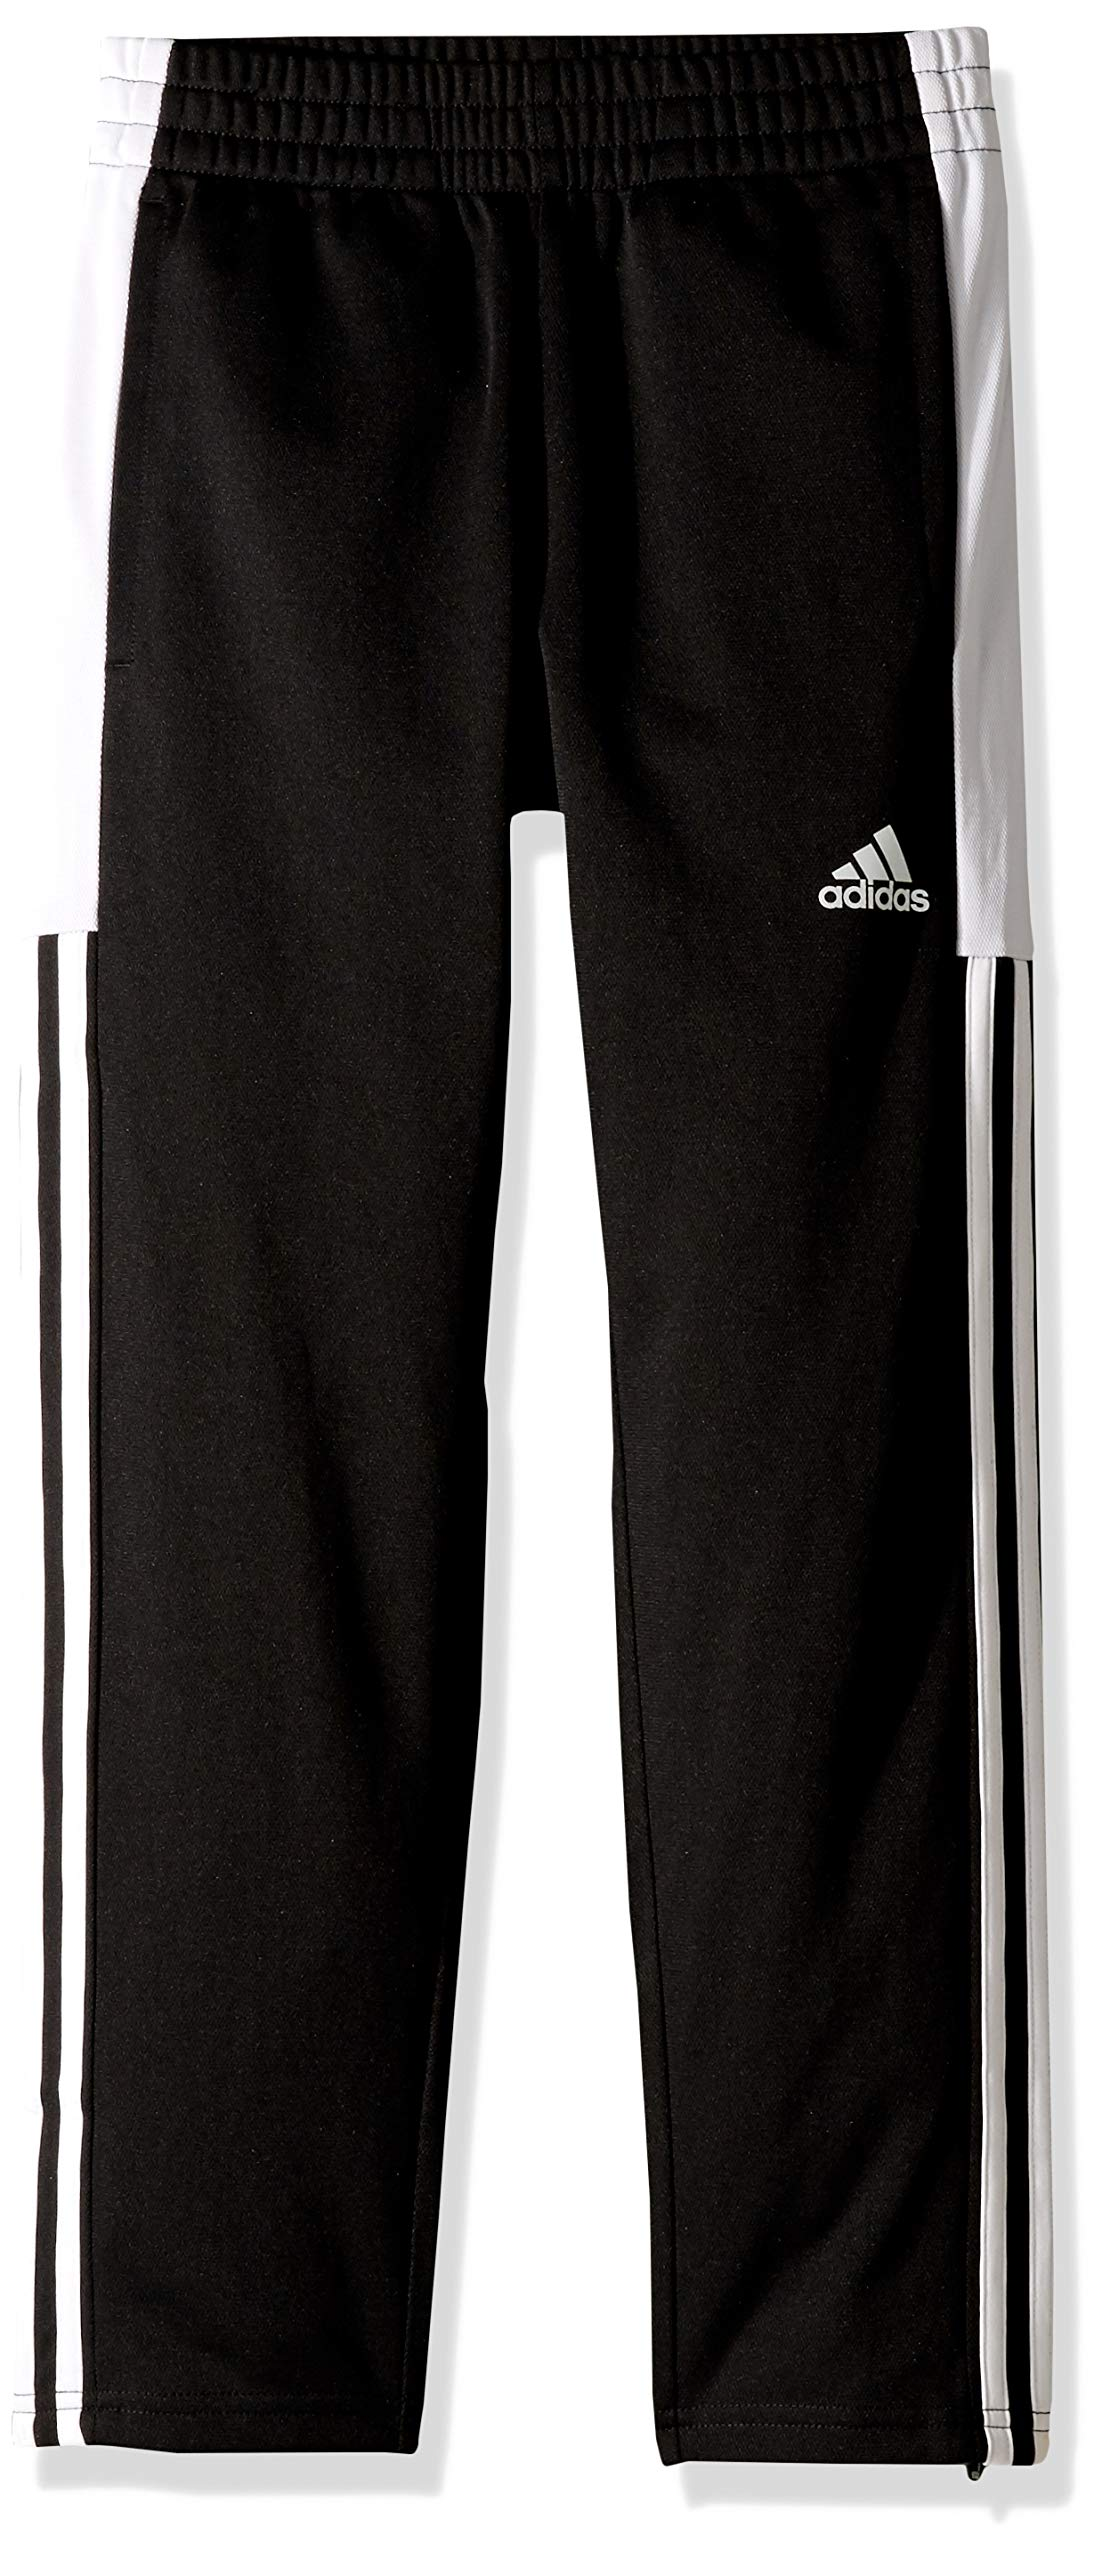 adidas Boys' Big Tapered Trainer Pant, Striker Black, M (10/12) by adidas